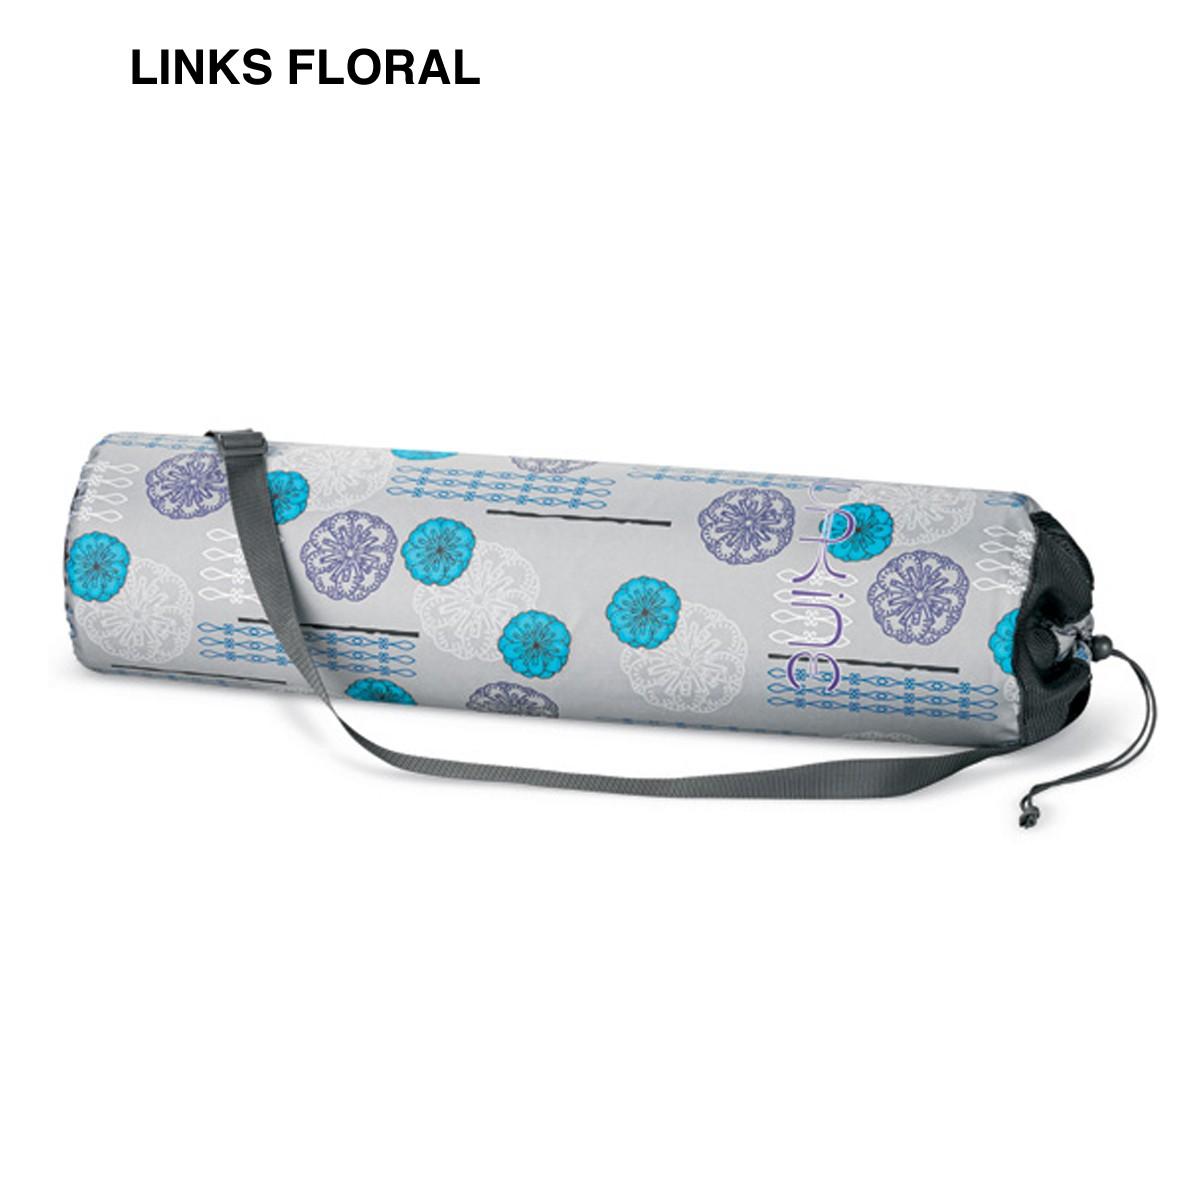 d3eb7501289d3 Dakine Kala Yoga Bag Links Floral